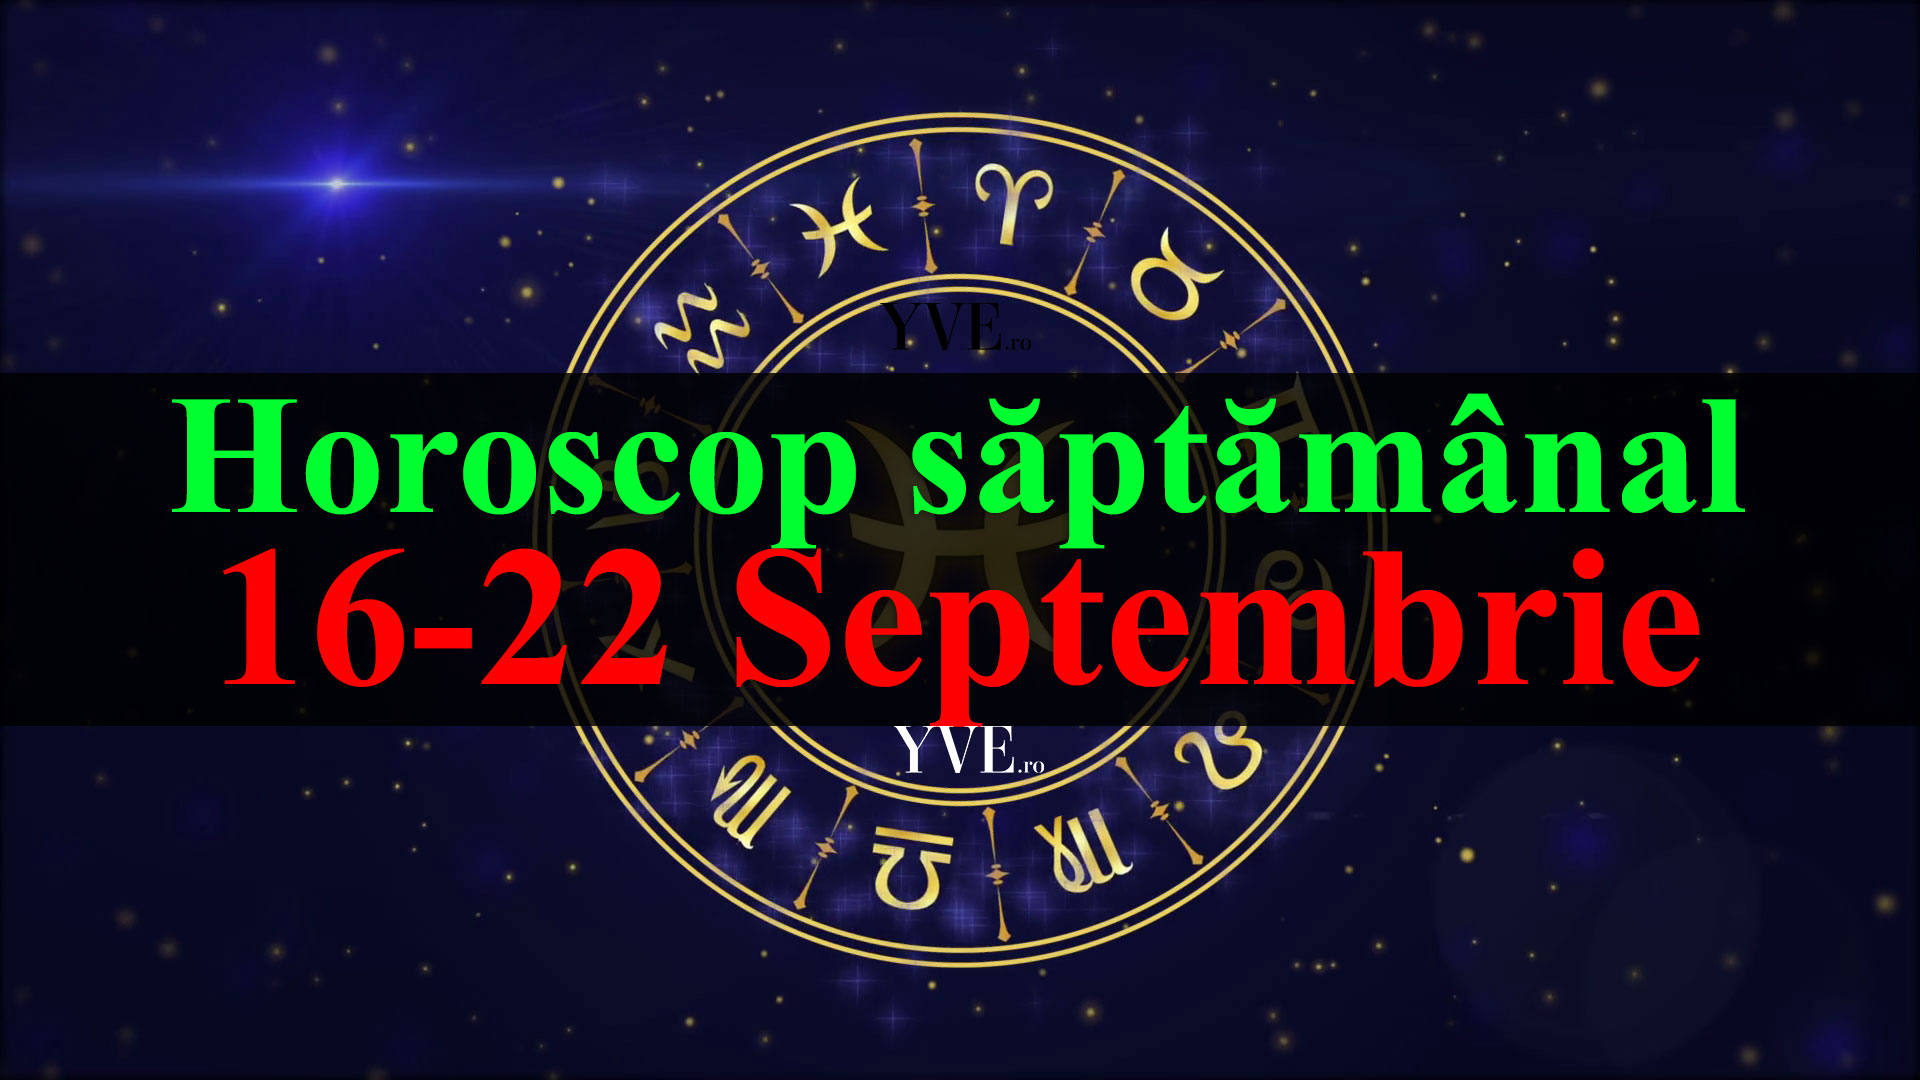 Horoscop saptamanal 16-22 Septembrie 2019